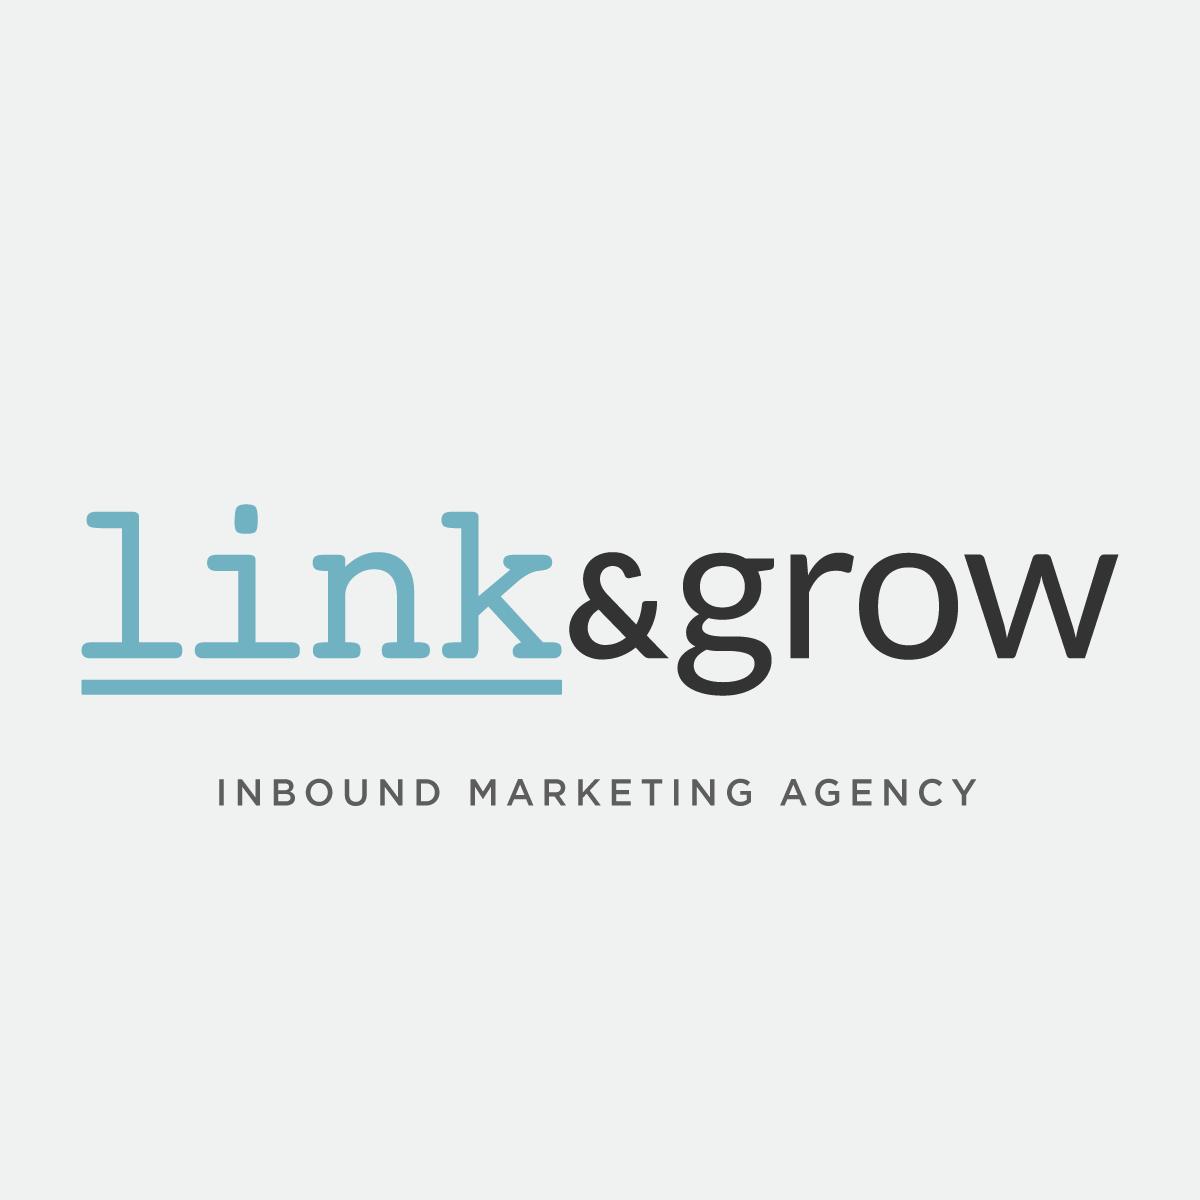 Link&Grow - Inbound Marketing Agency Logo